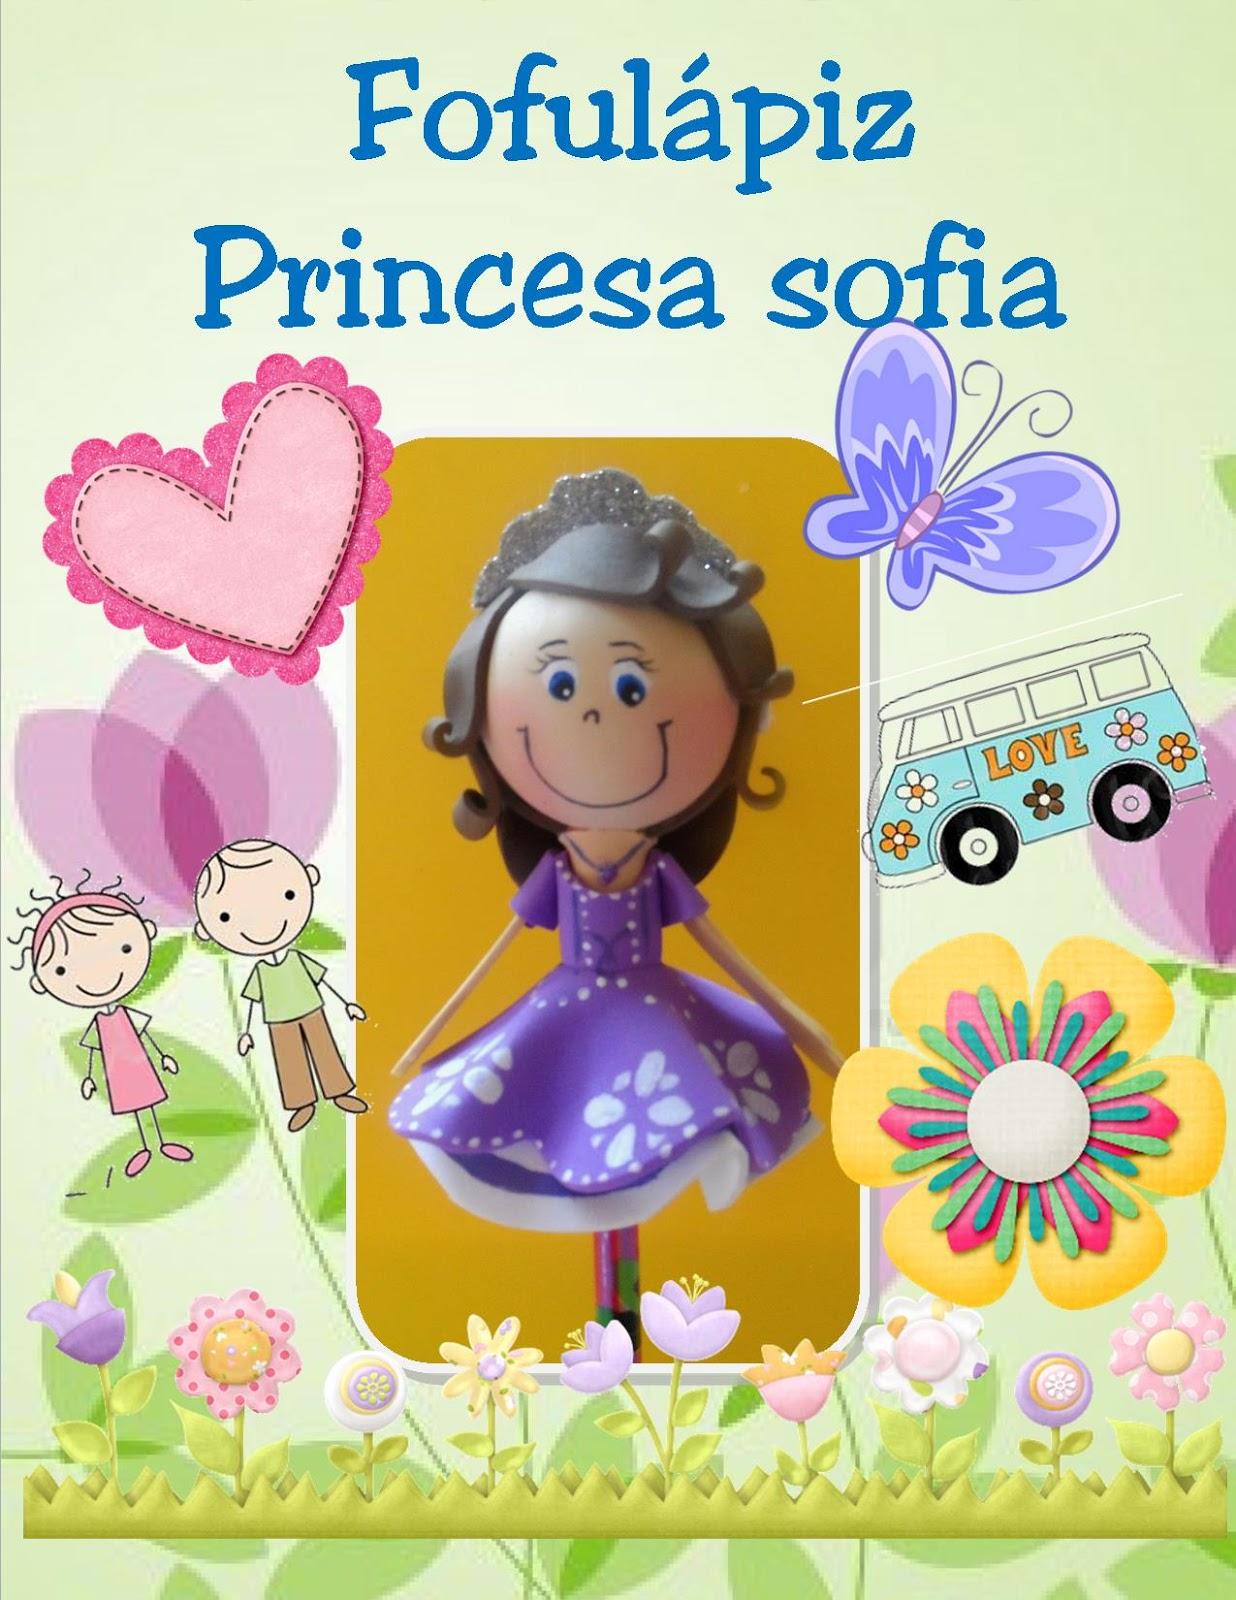 http://todoamano-veti.blogspot.com/p/princesa-sofiax.html